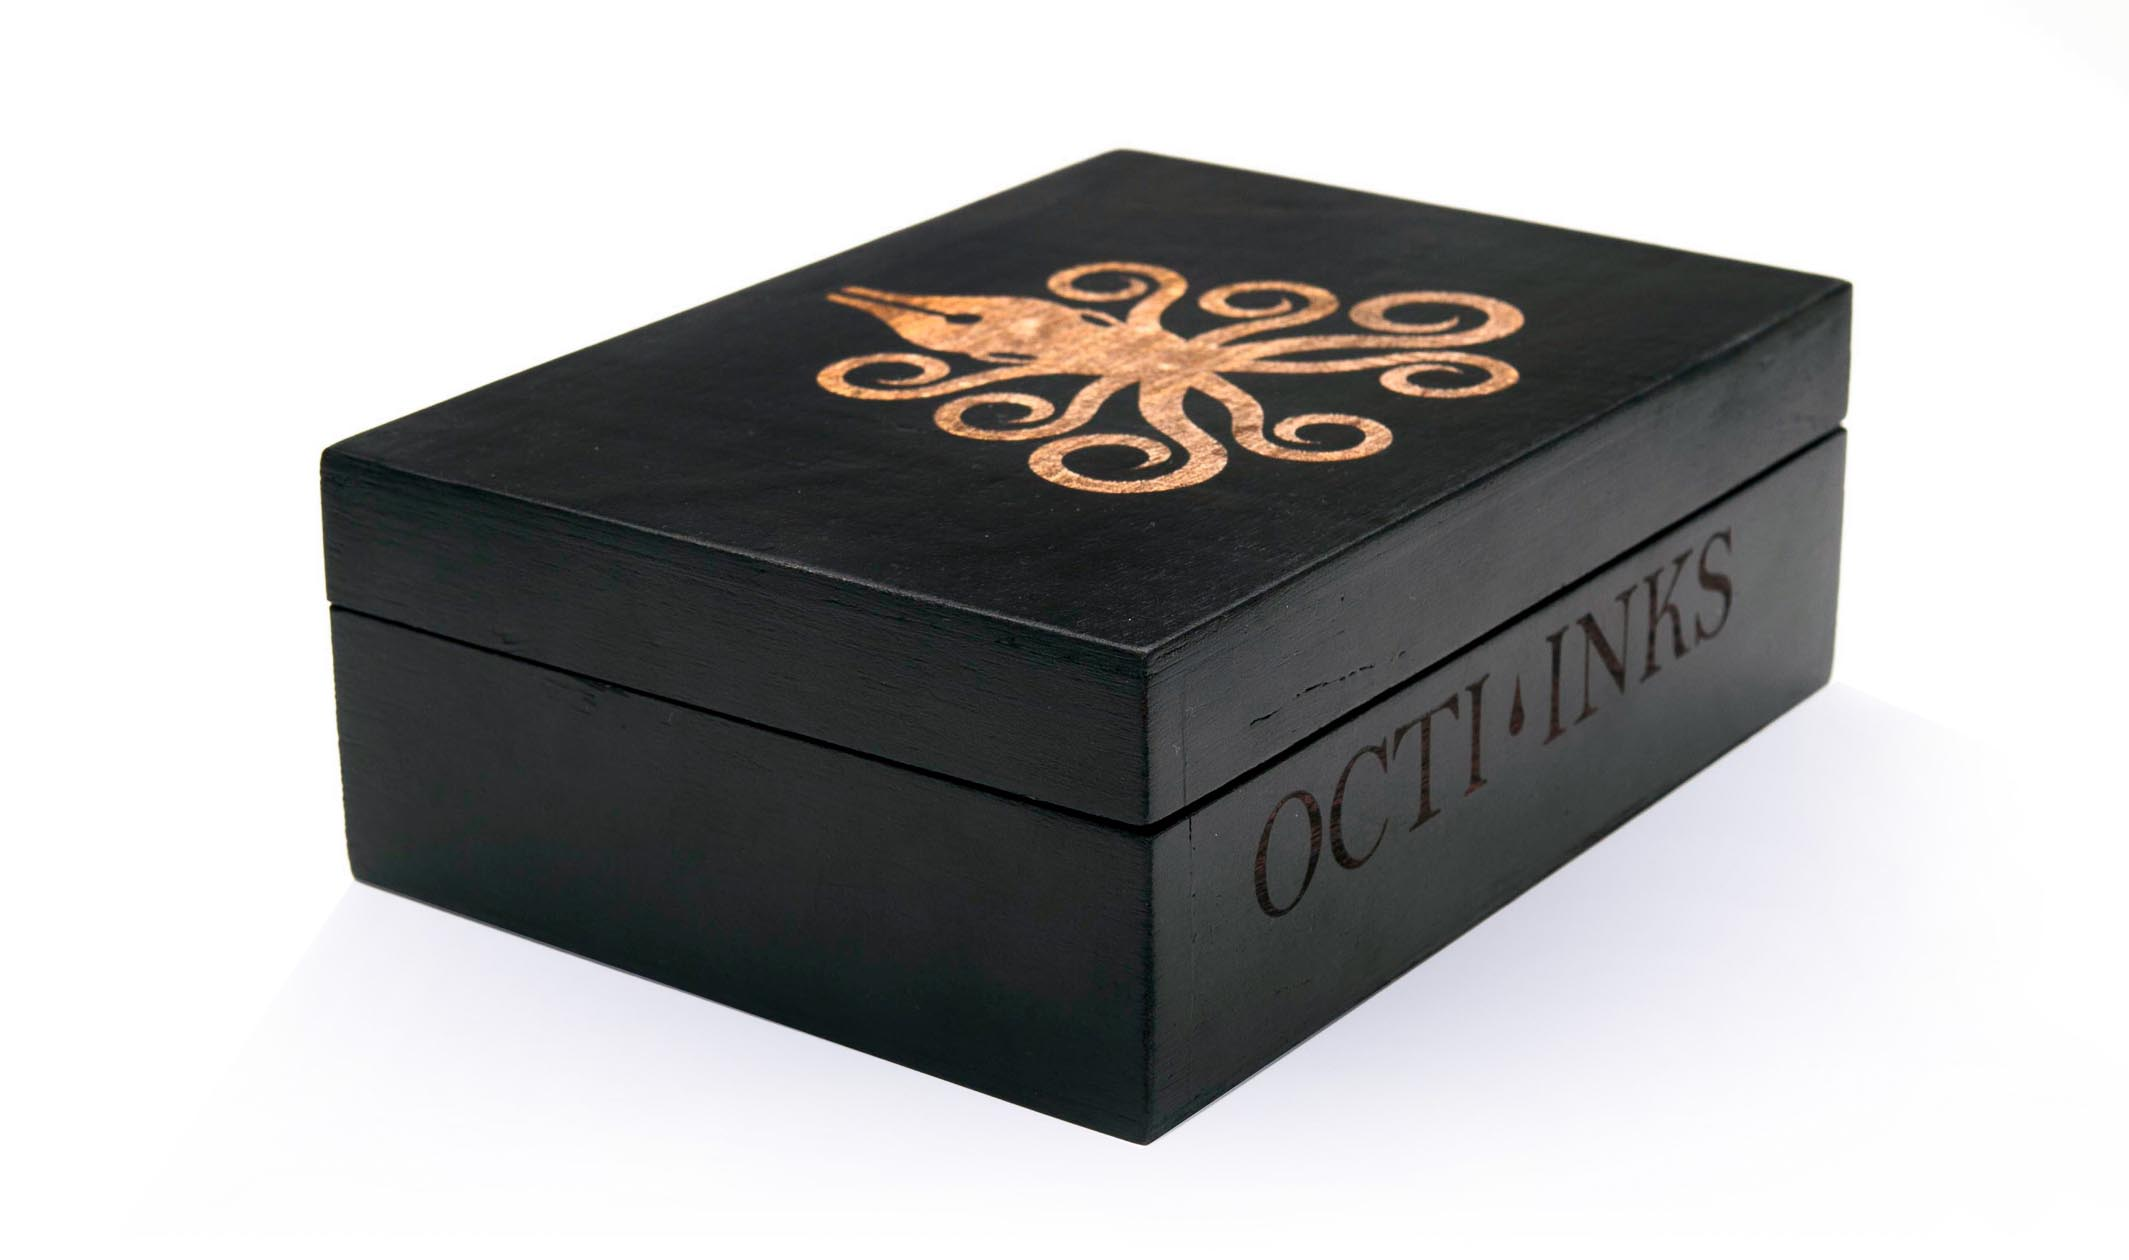 Ocit-Inks box2.jpg